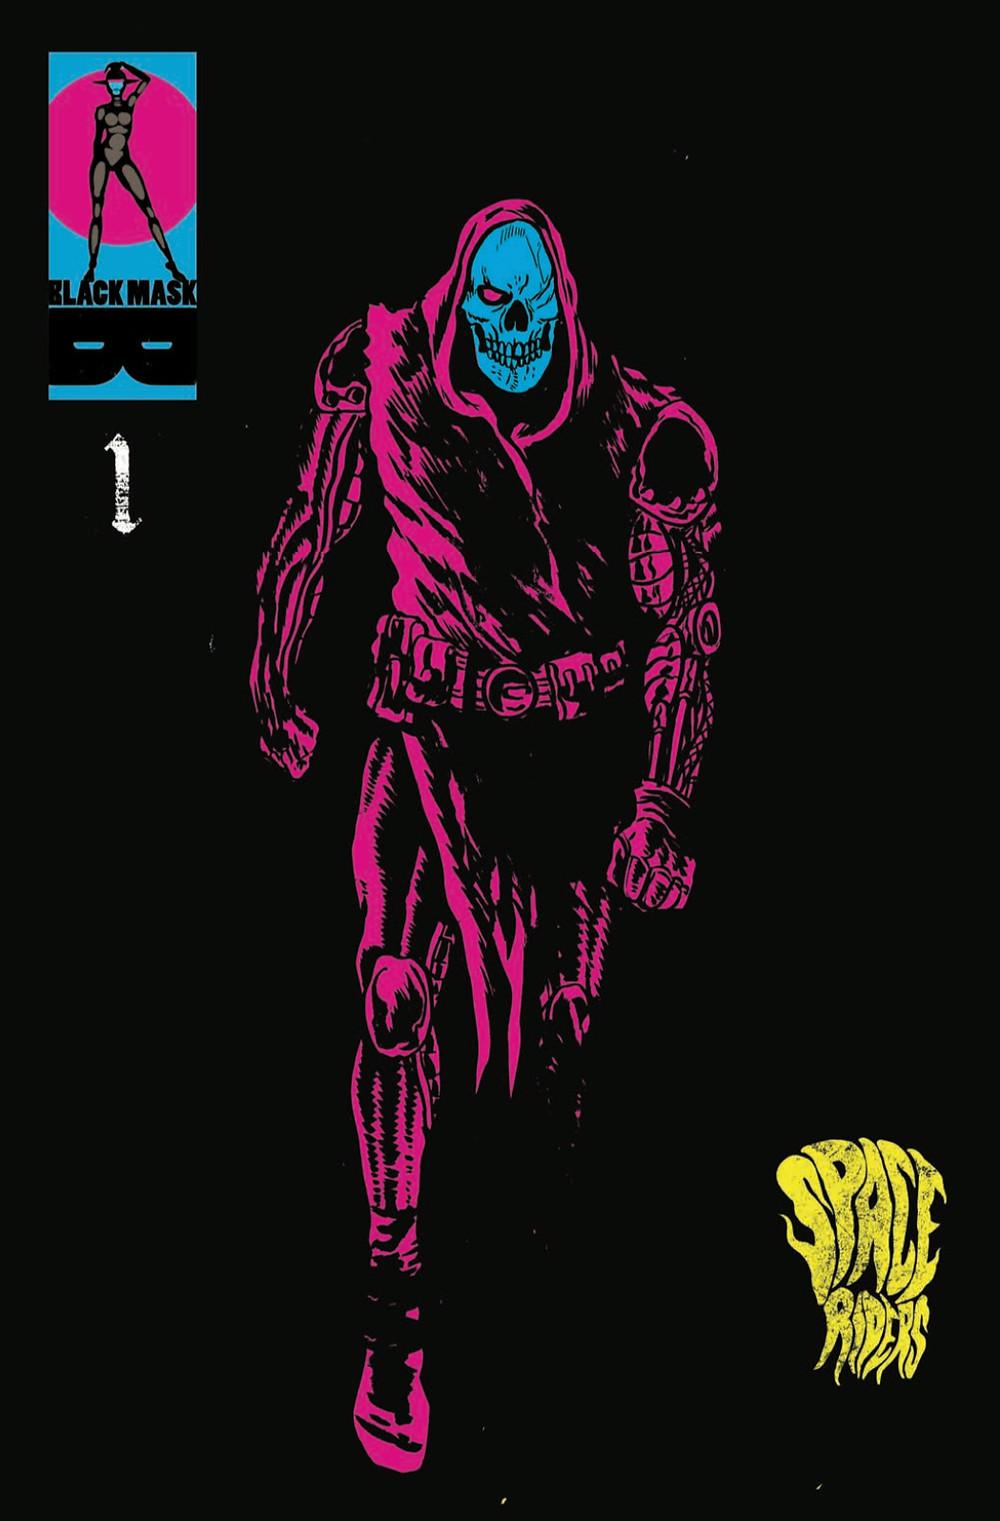 Space Riders, issue #1, cover, Black Mask Studios, Giffoni/Ziritt